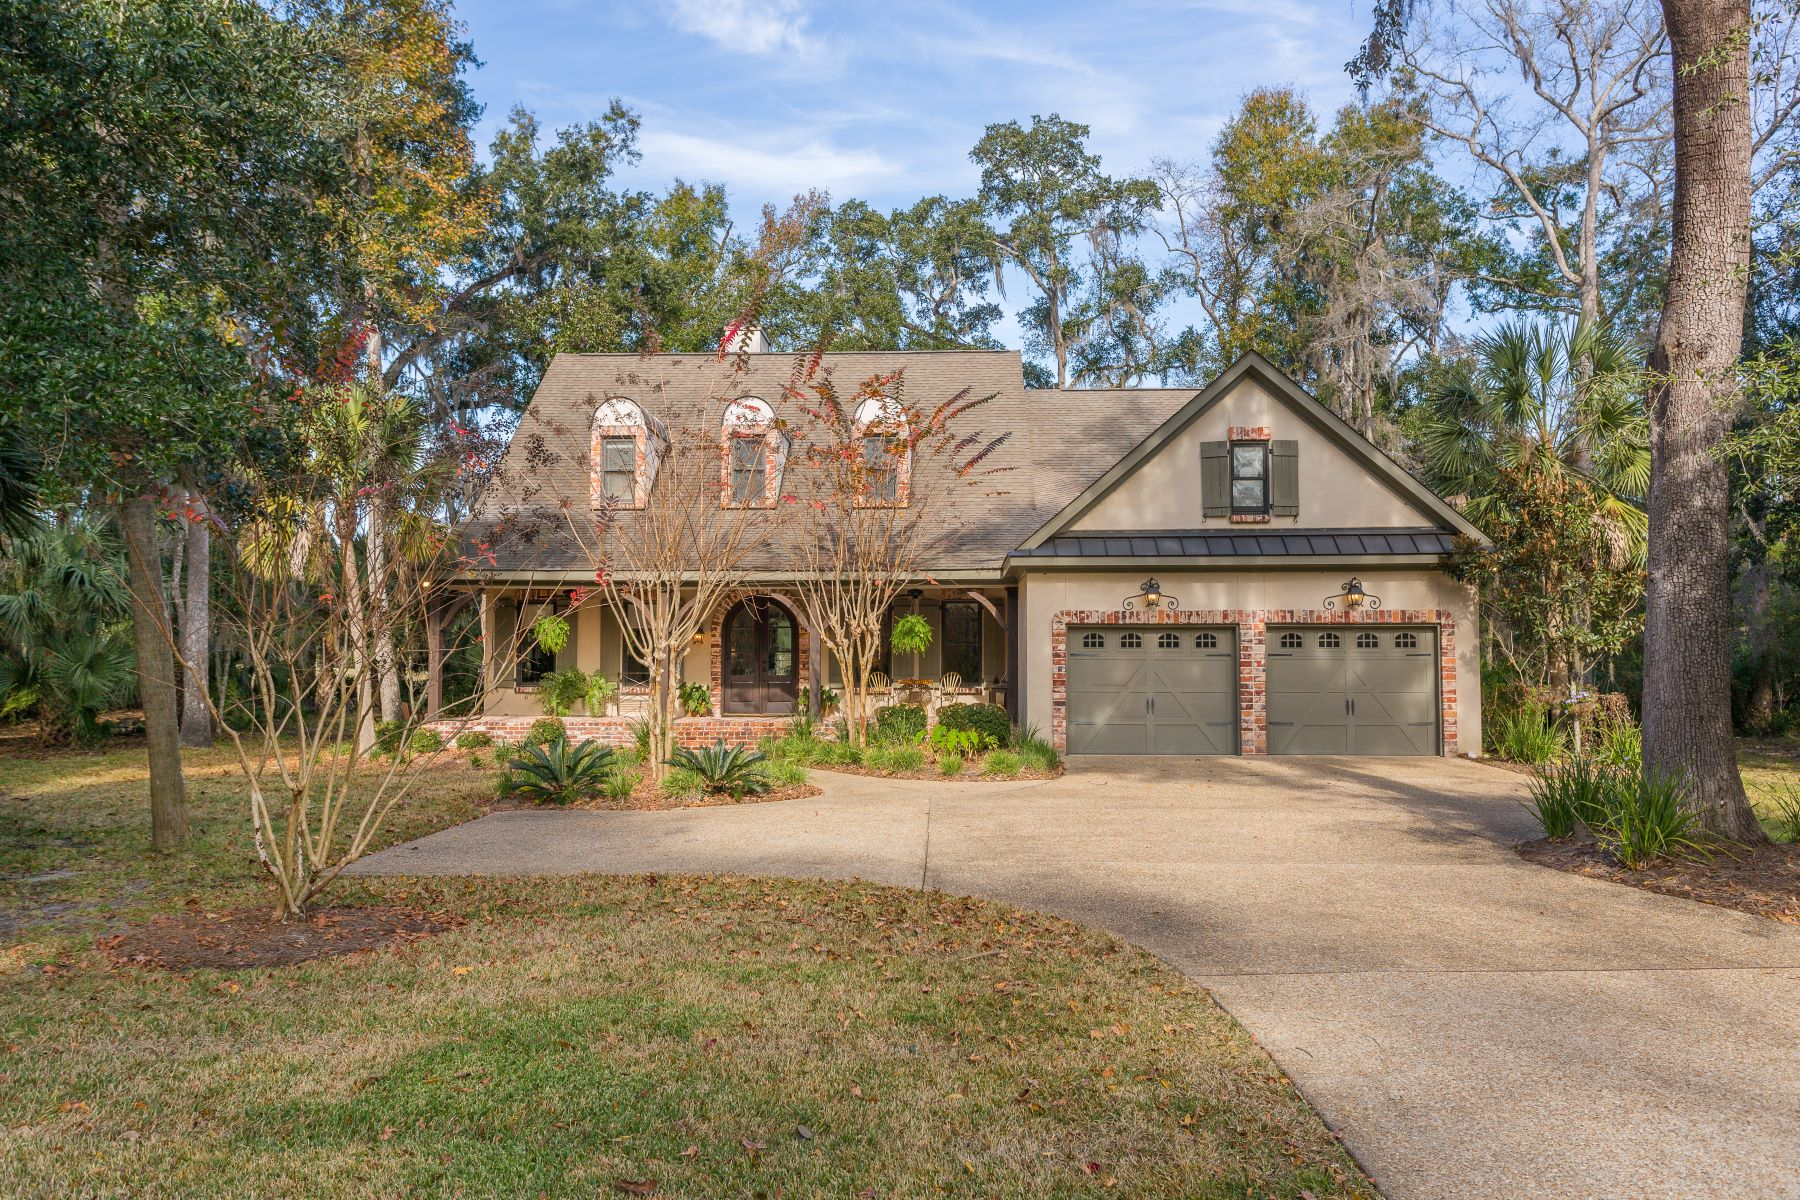 Single Family Homes for Sale at 277 Audubon Wynd Waverly, Georgia 31565 United States